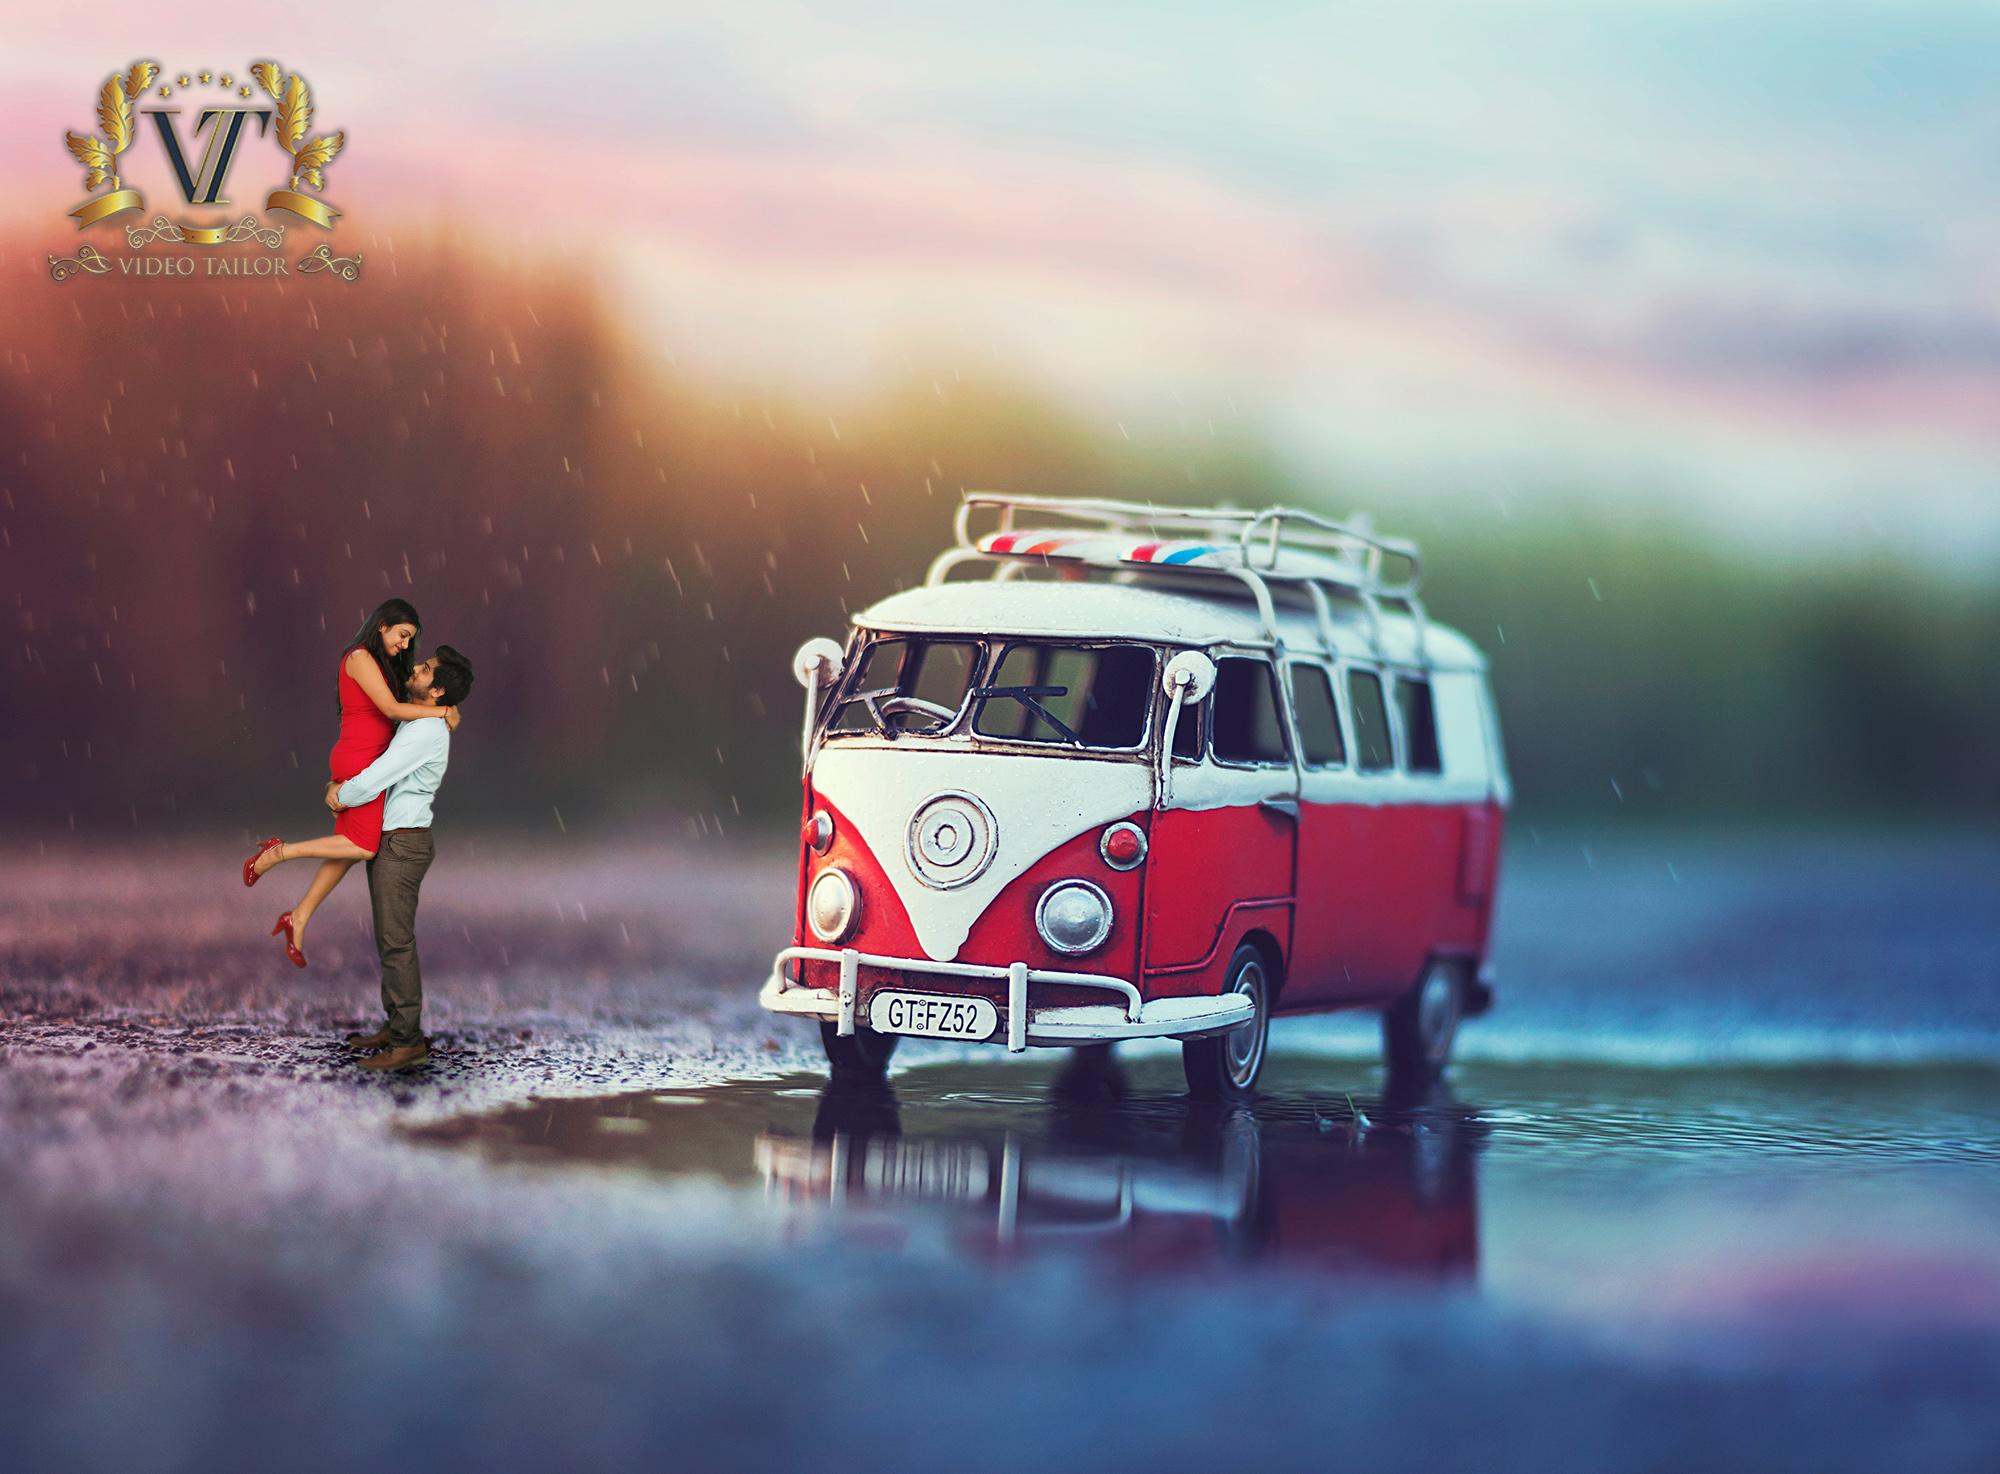 Miniature Photography | Miniature Shoot |